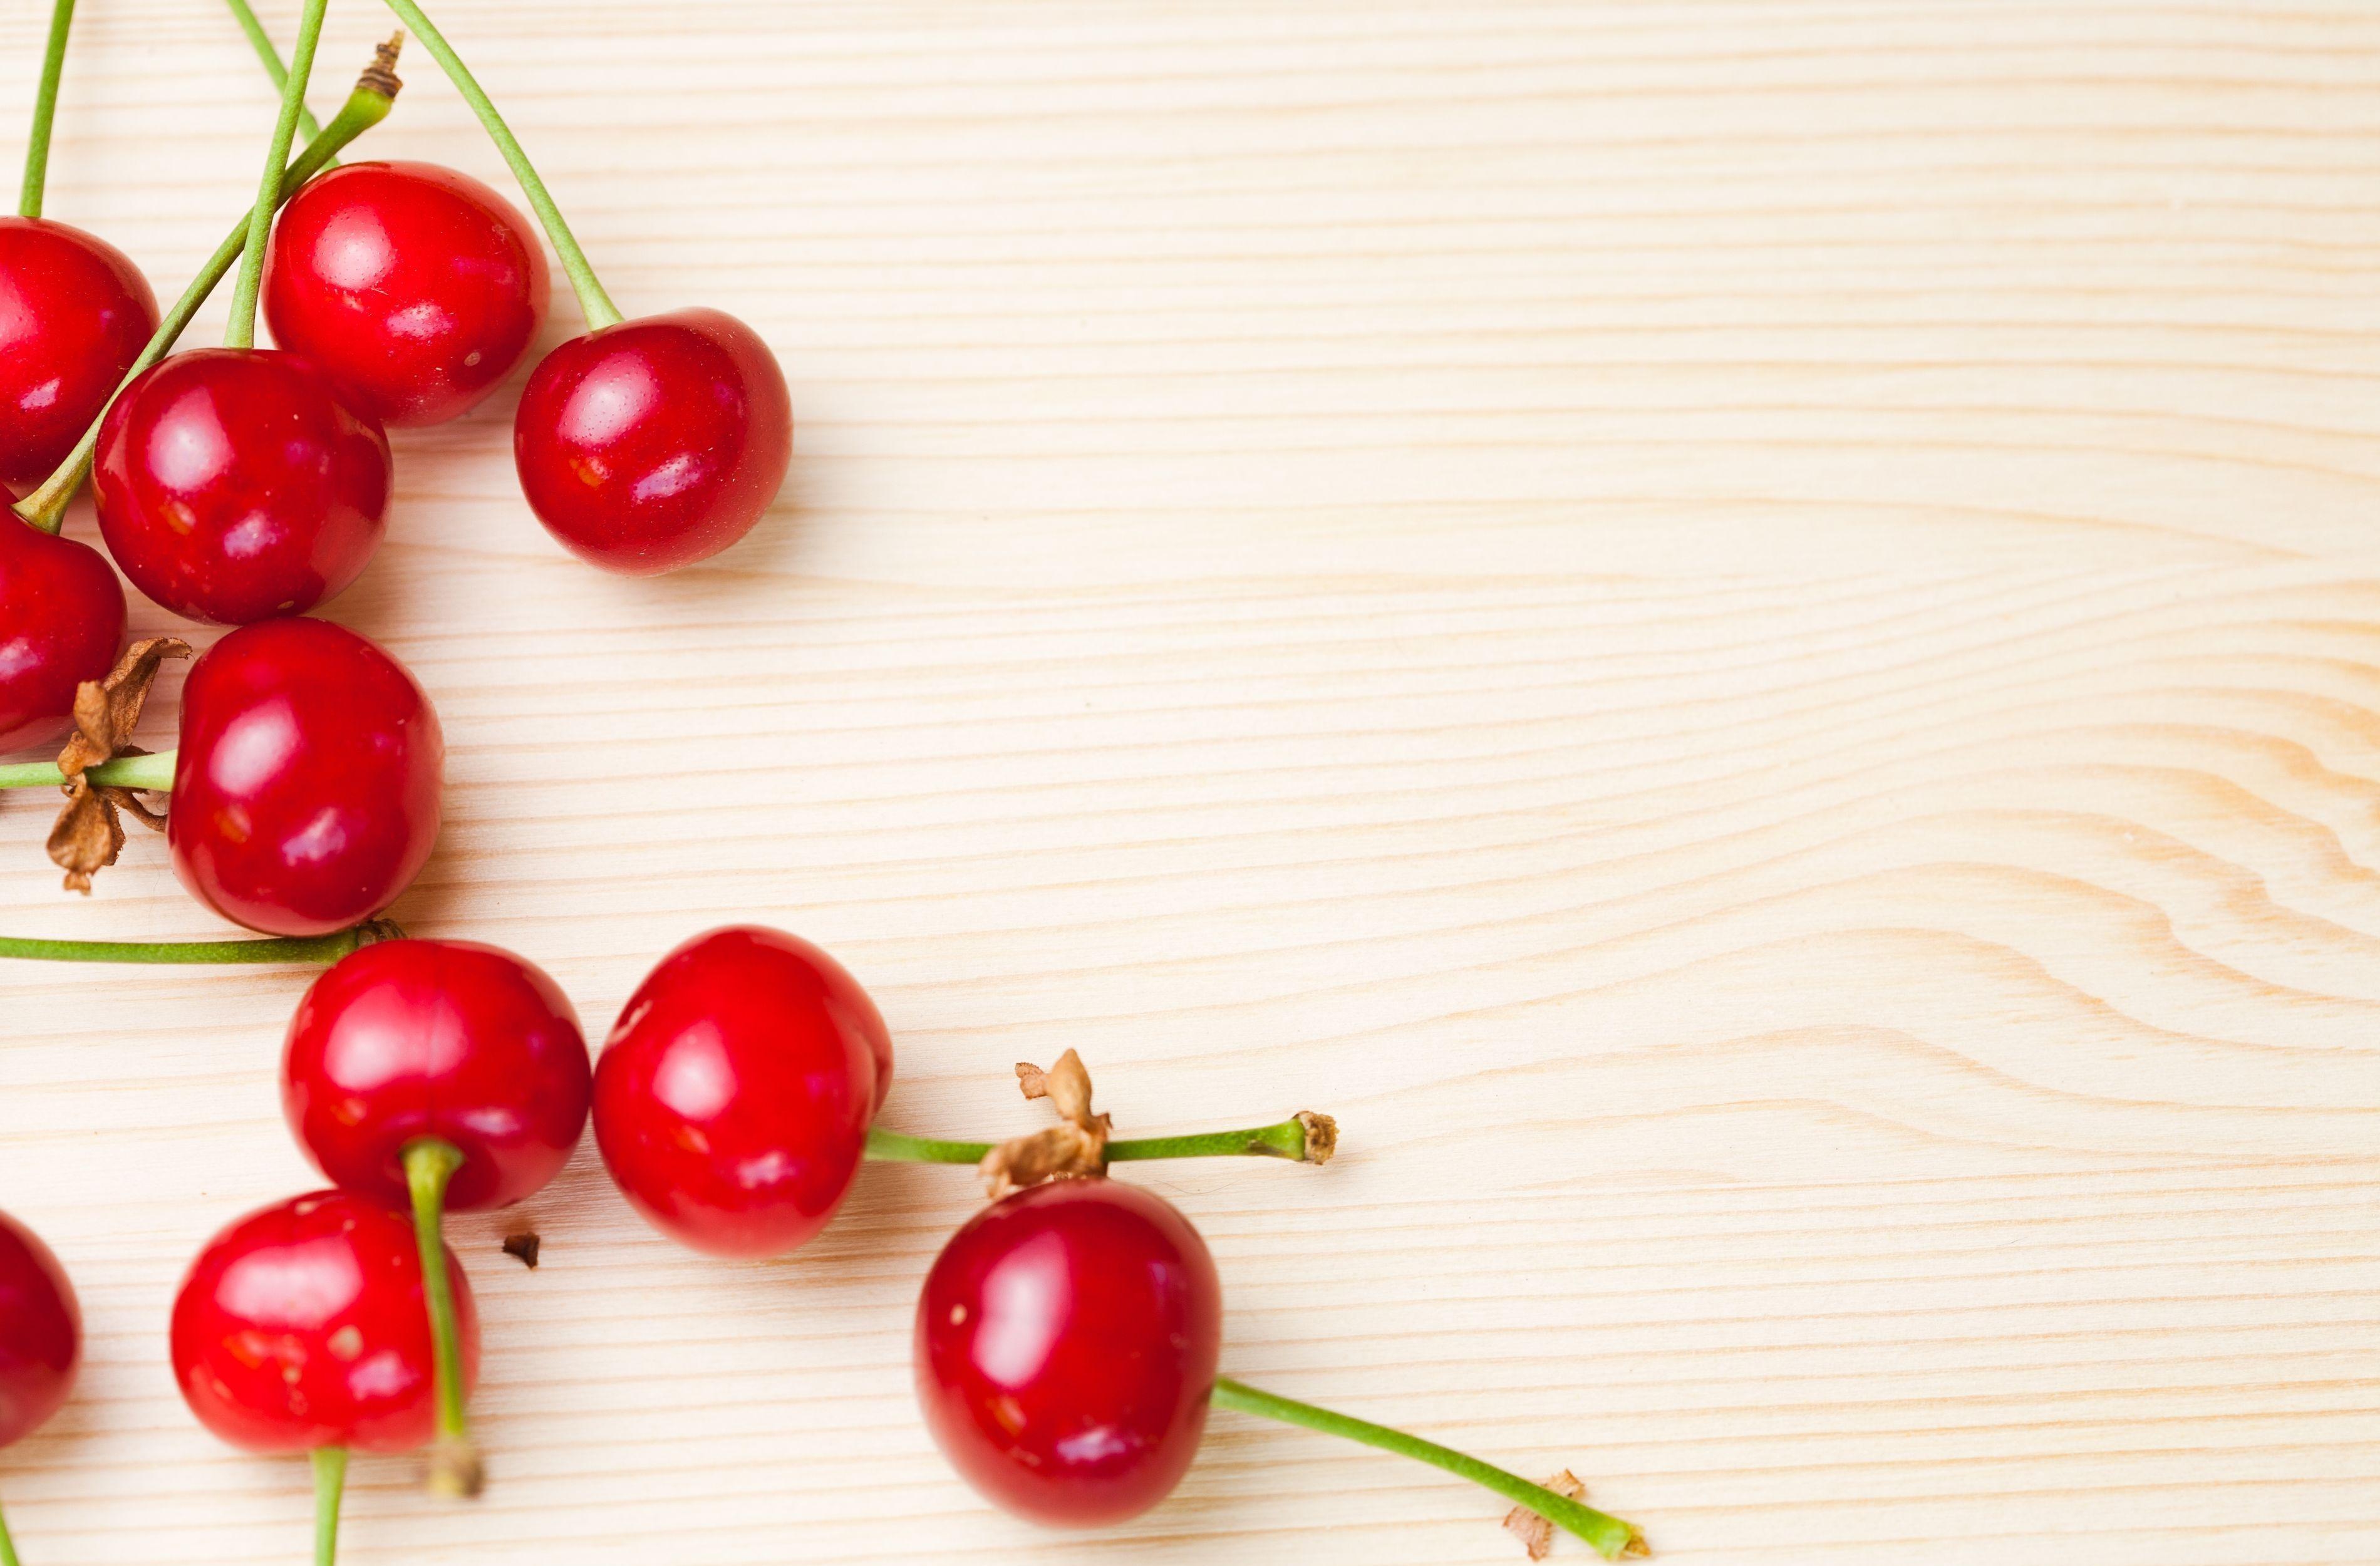 cherry fresh texture image background food wallpaper 3800x2500